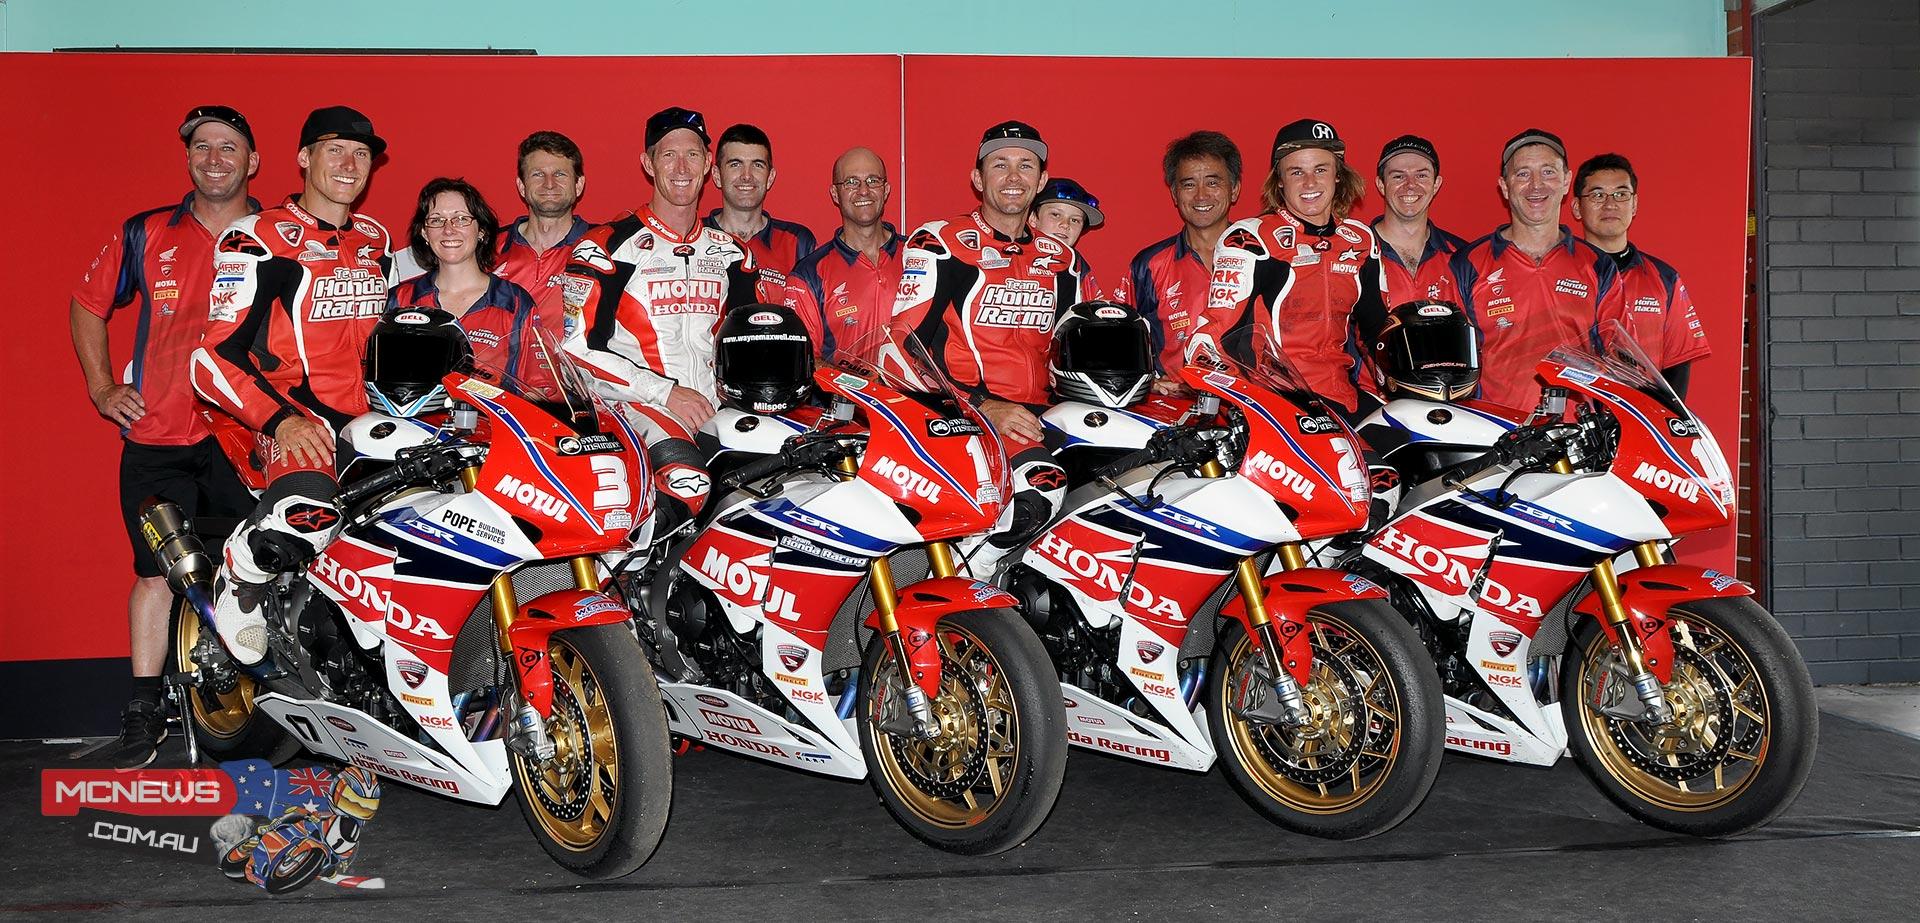 Team Honda 1-2-3-5 in 2014 Swann Australasian Superbike Championship